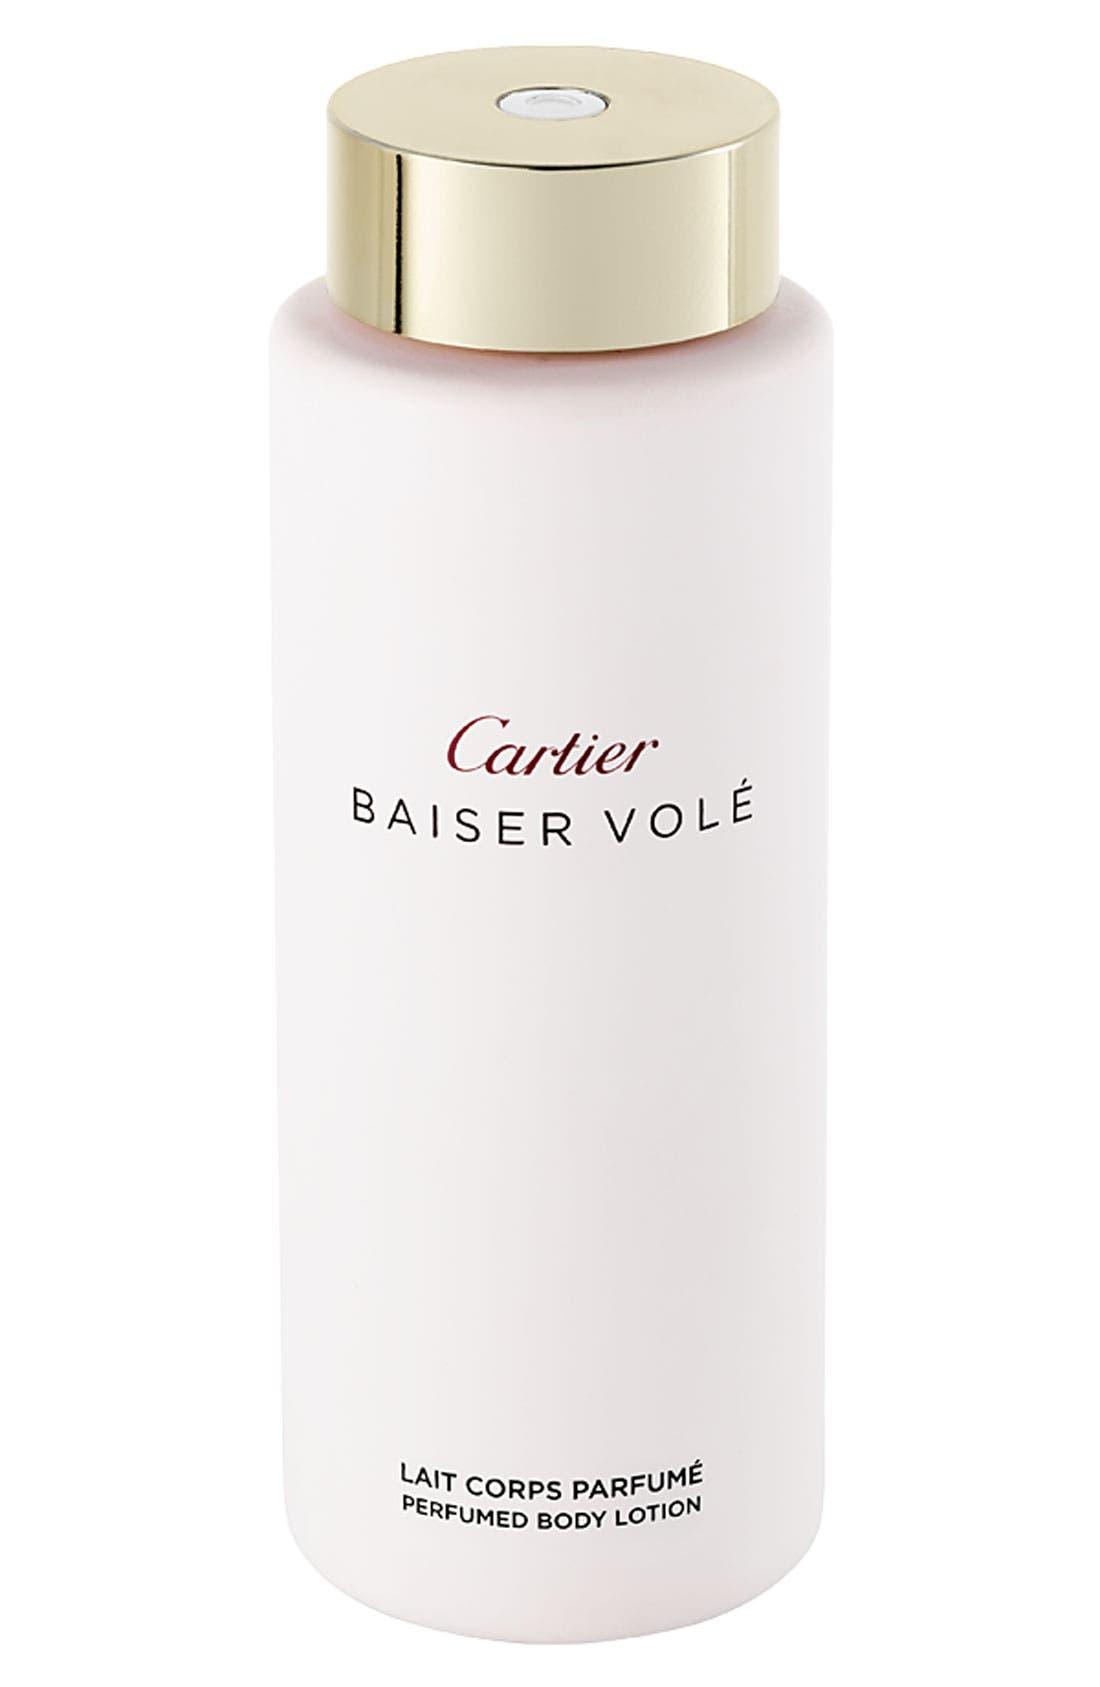 Cartier 'Baiser Volé' Perfumed Body Lotion,                             Main thumbnail 1, color,                             NO COLOR